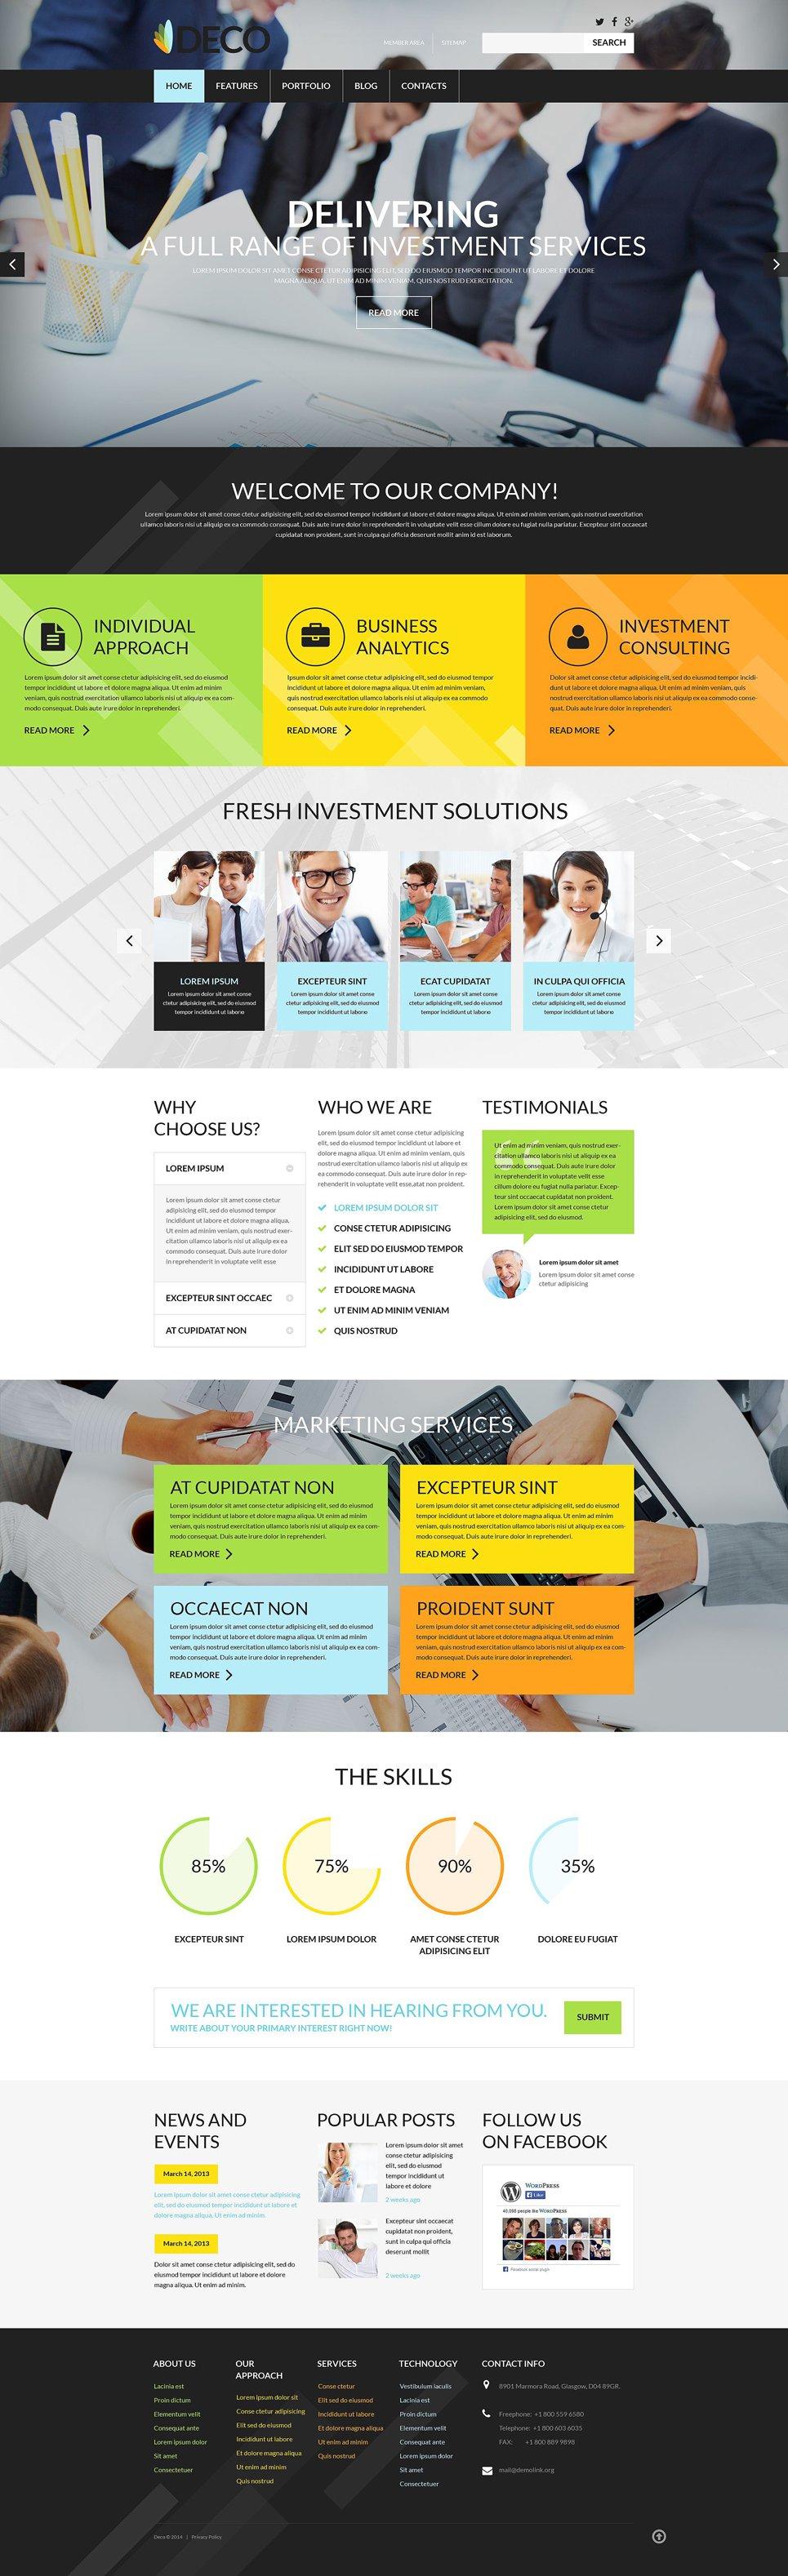 Адаптивный шаблон сайта на тему бизнес и услуги #52504